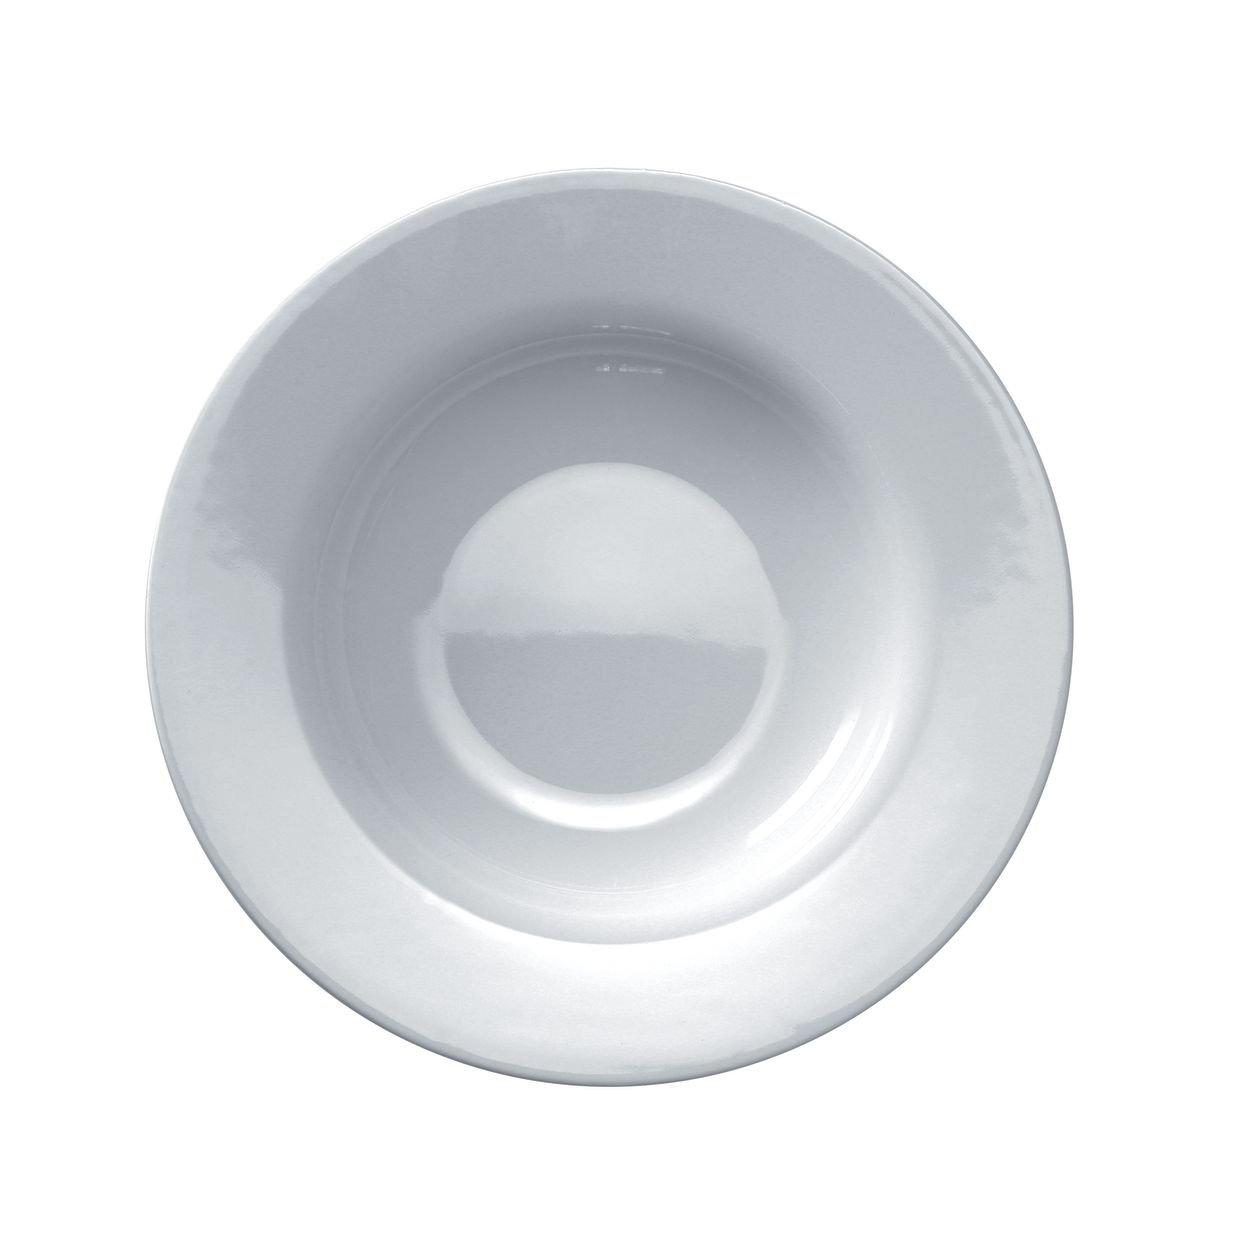 A di Alessi 8-3/4-Inch Platebowlcup Soup Bowl, White Porcelain, Set of 4